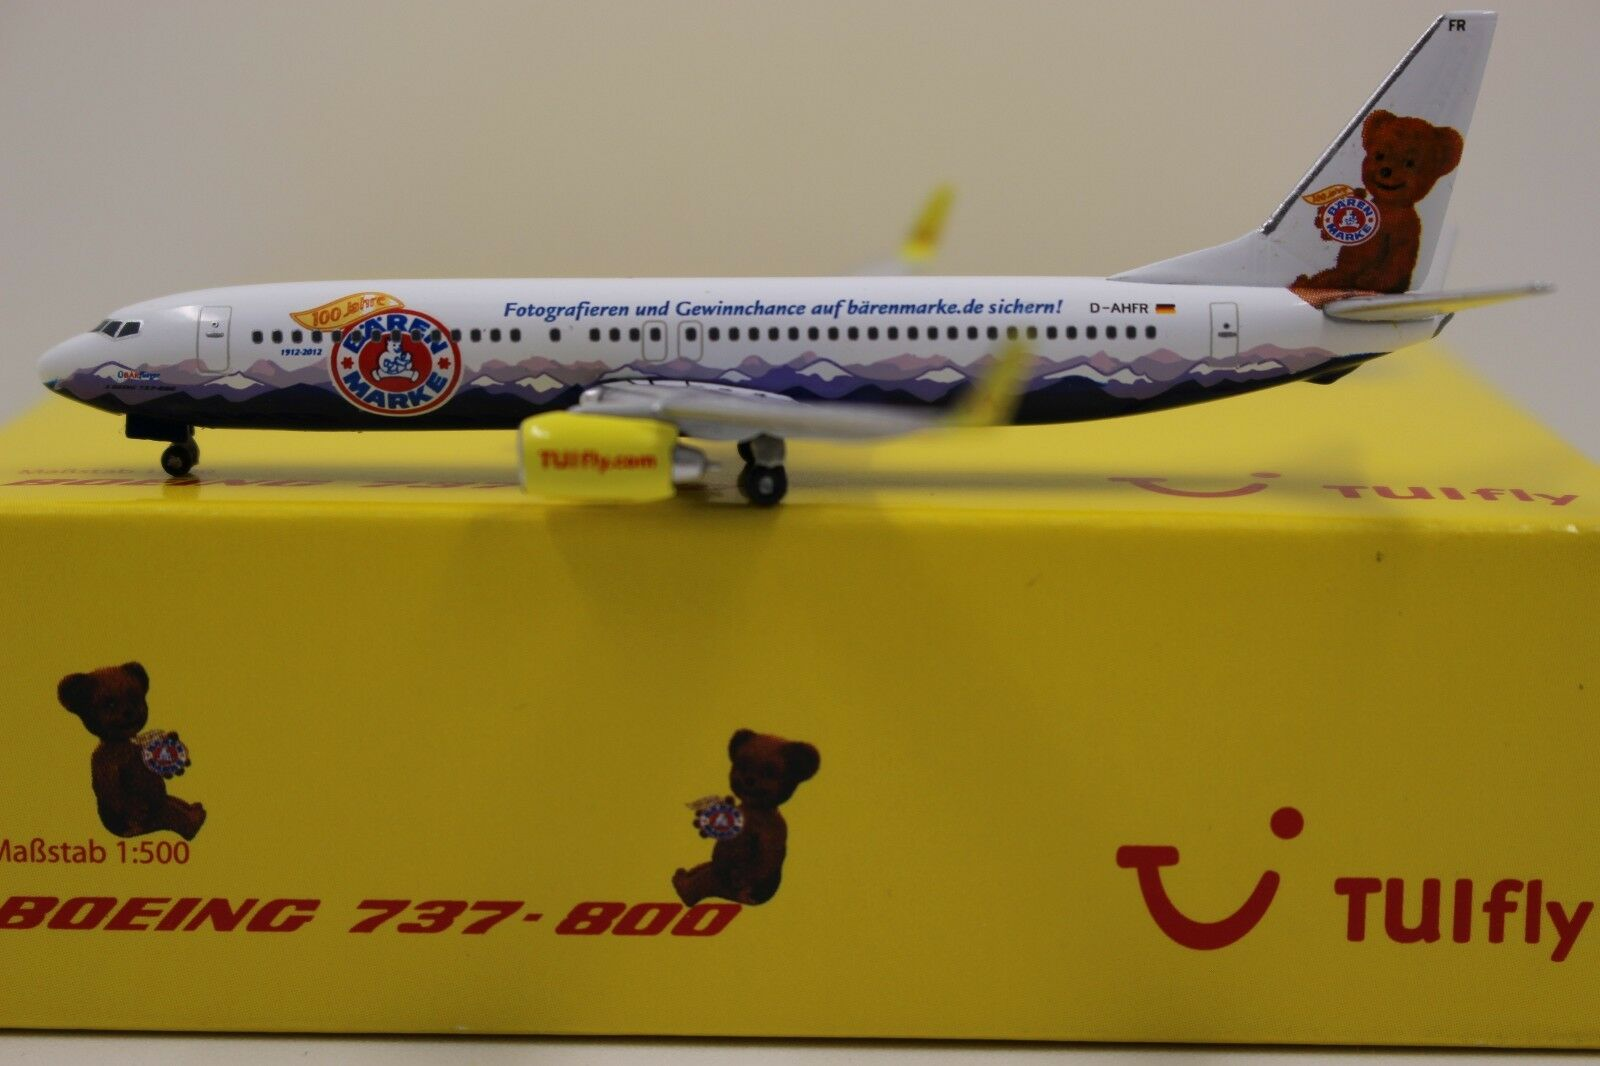 Herpa Wings 1 500 TUIfly boeing 737-800 bärenmarke (523400) (523400) (523400) aba795